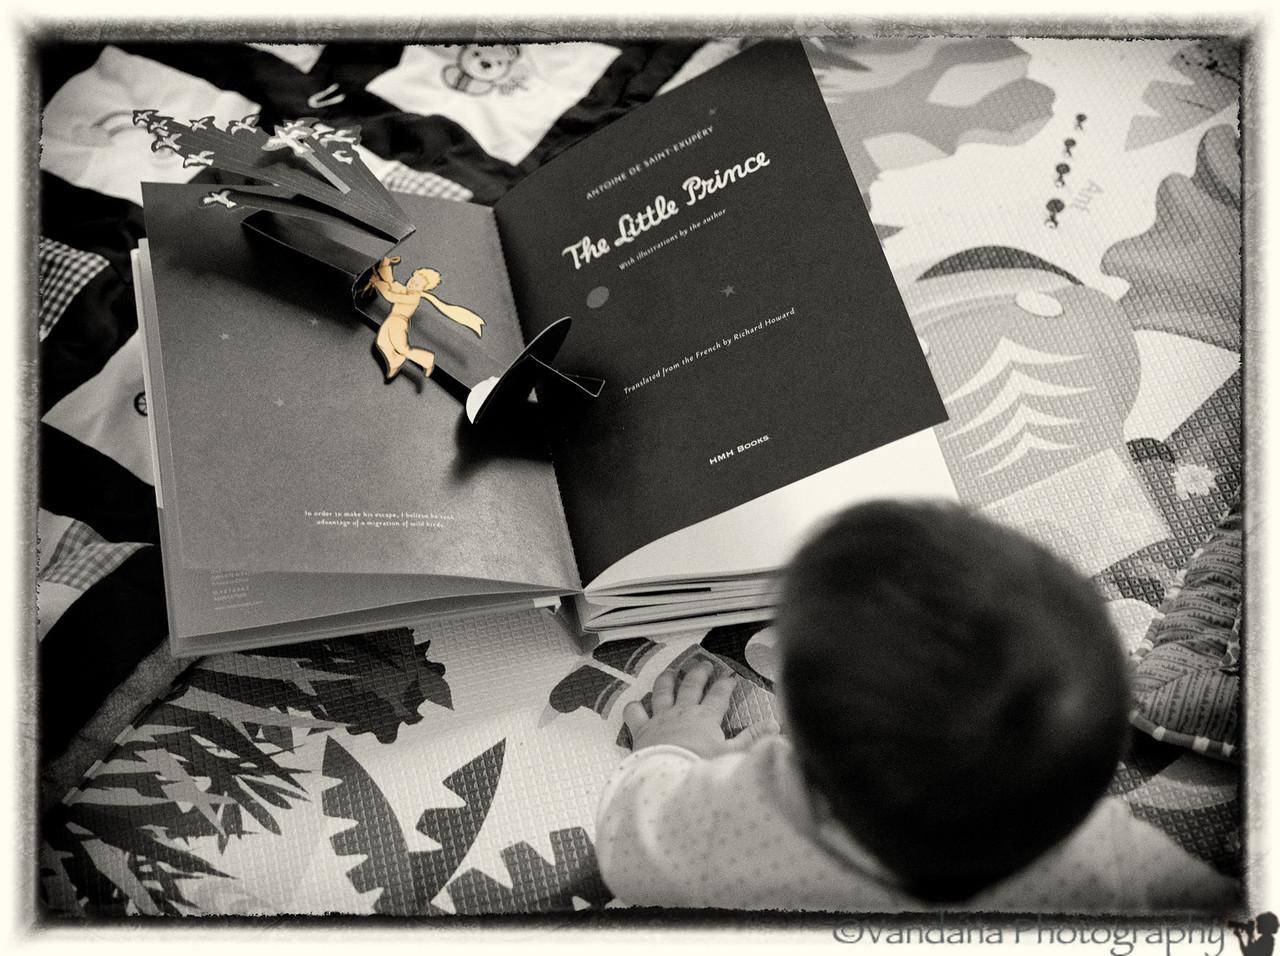 November 7, 2012 - My little prince